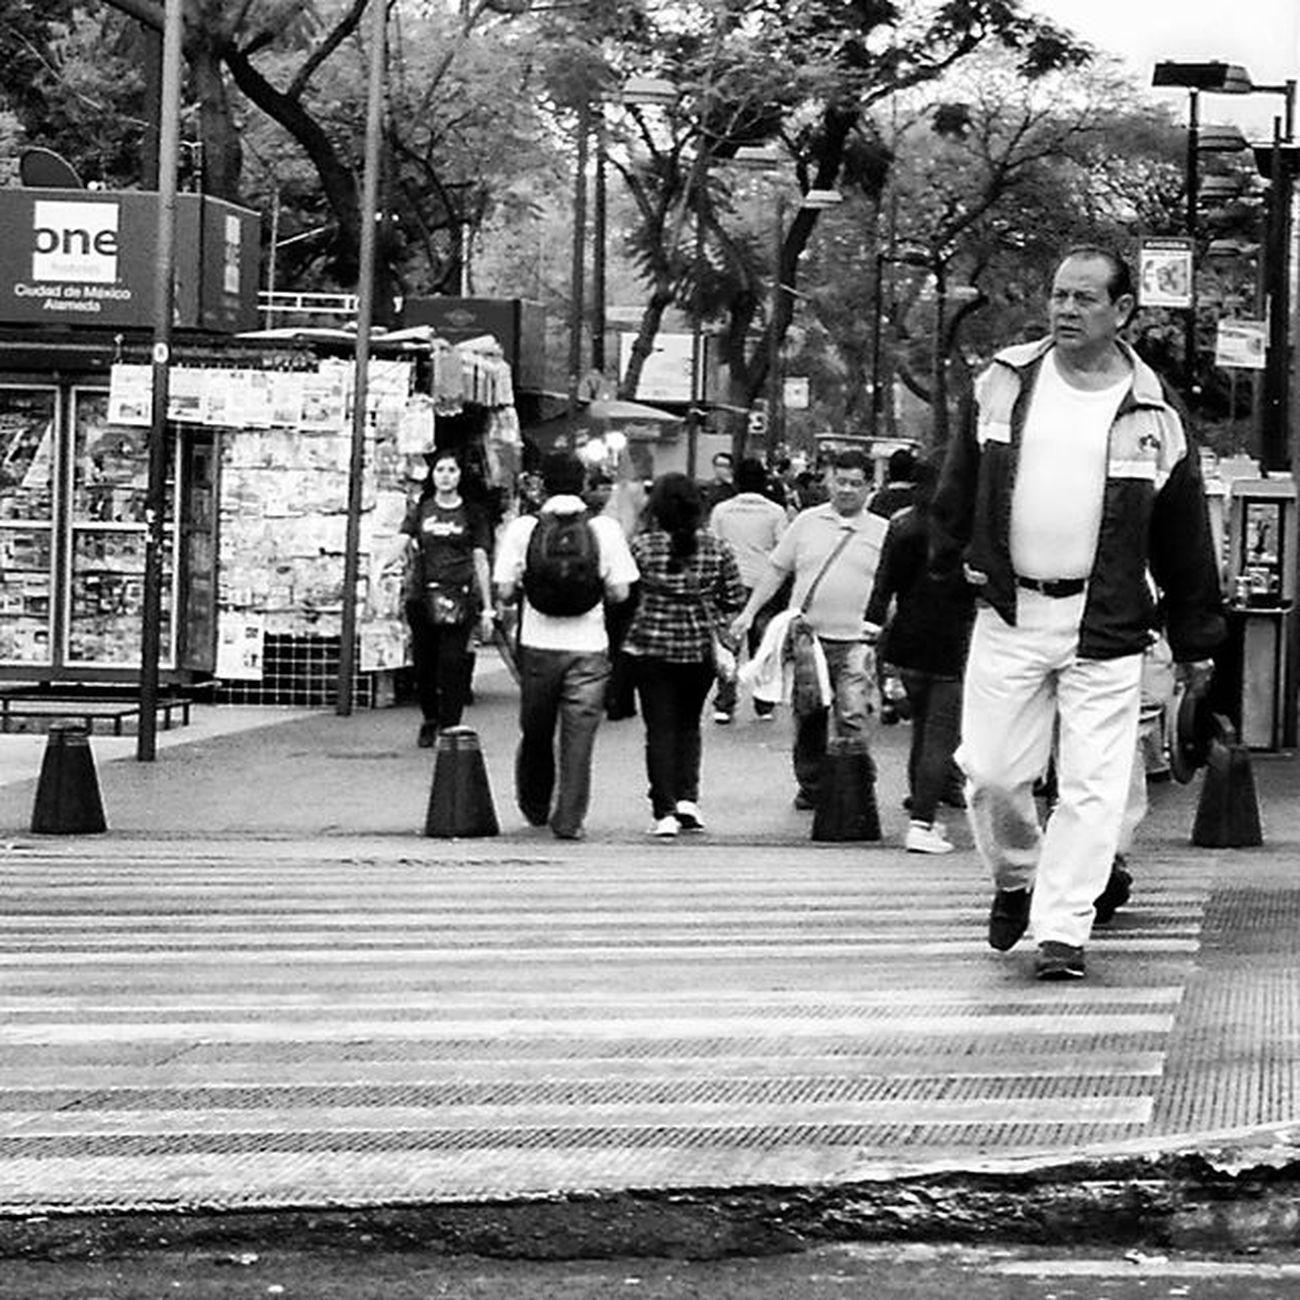 Walking in Mexico City IX Streetlife Streetphotography Urbanlife Mobilephotography Mexicocity  Blackandwhite Bw